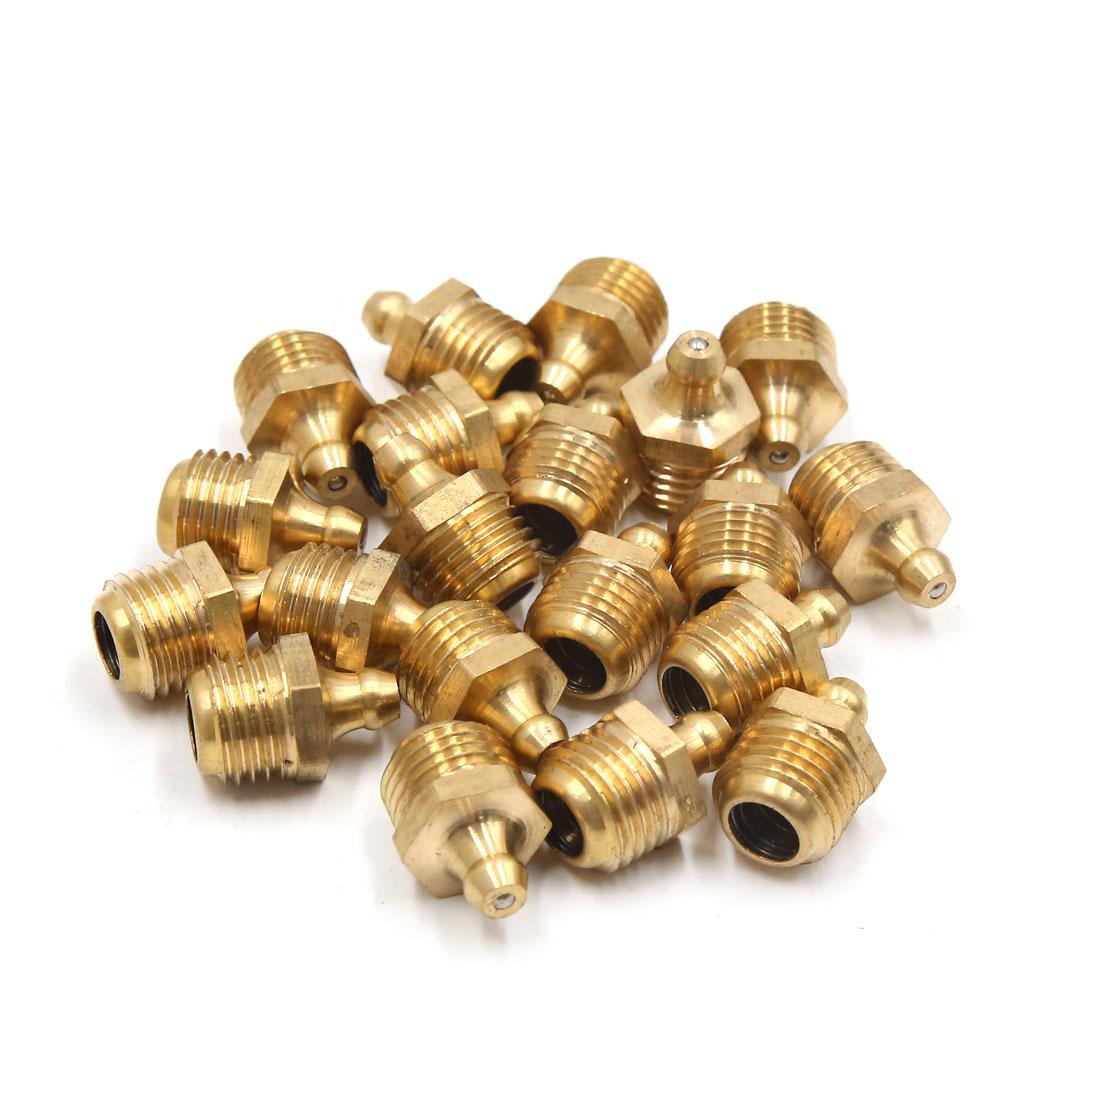 20Pcs M14 x 1.5 Thread Brass Straight Car Grease Zerk Nipple Fitting